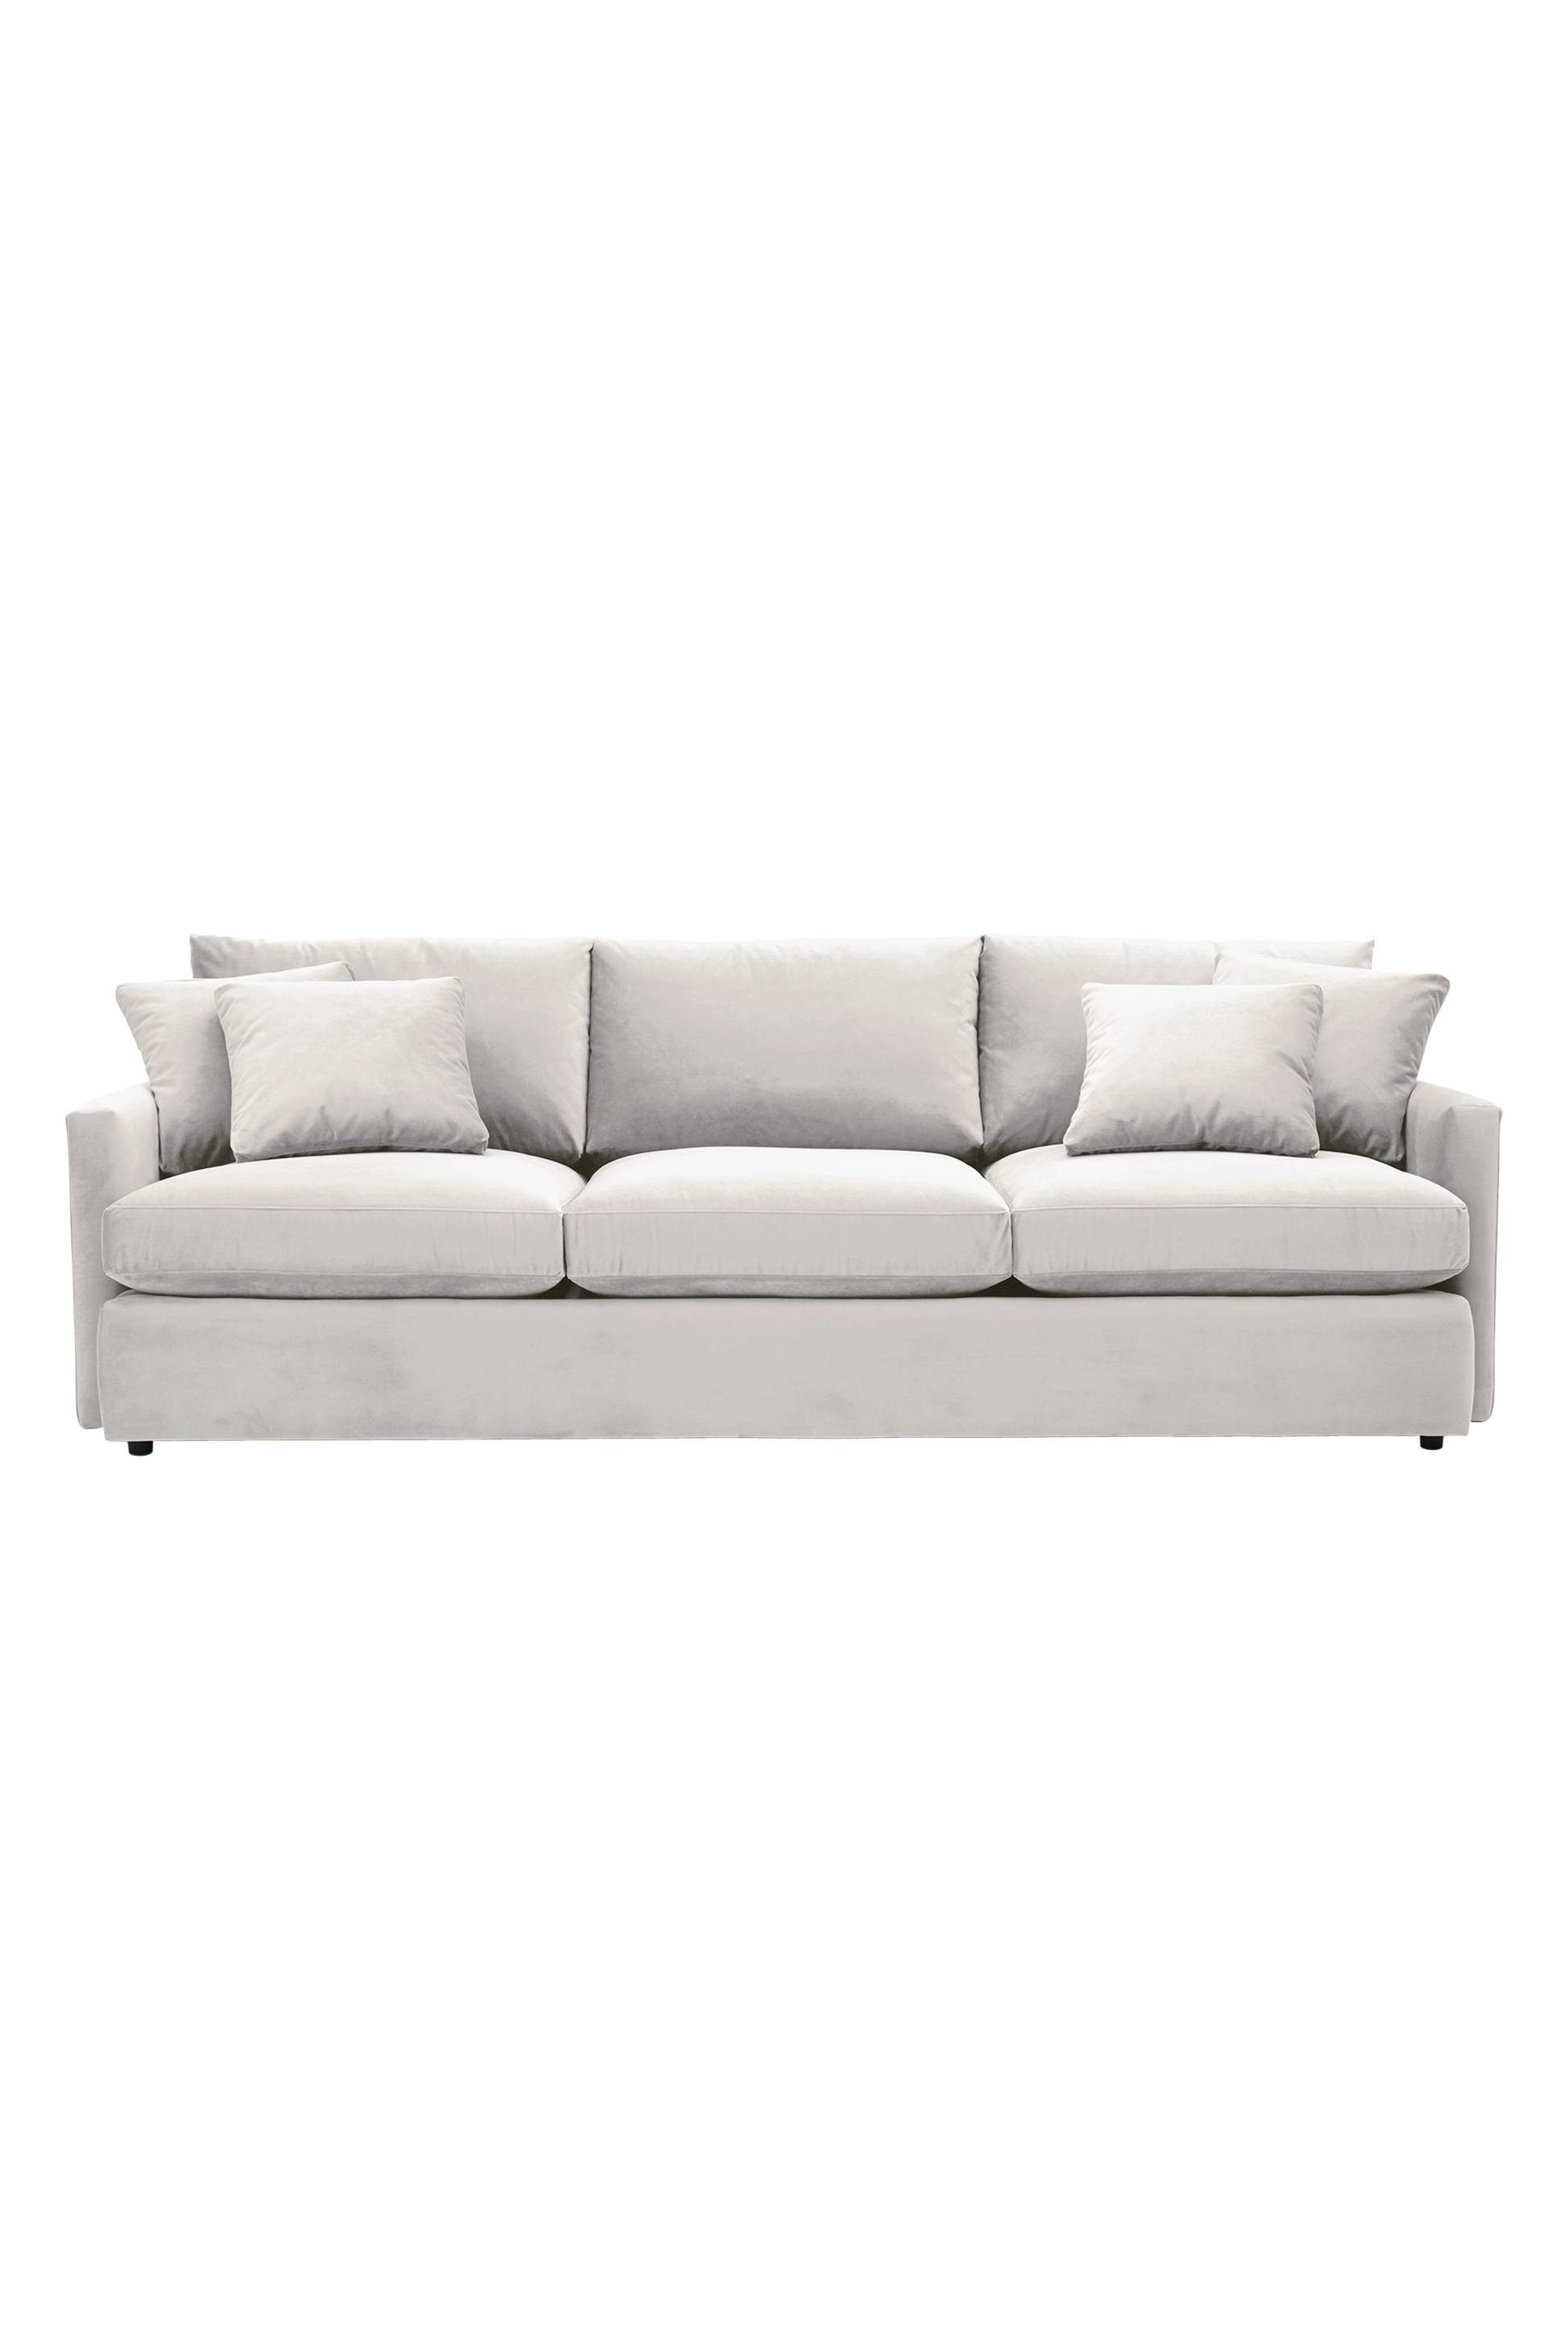 sofa set below 3000 in hyderabad black leather corner argos 13 best cheap sofas under  top inexpensive couches